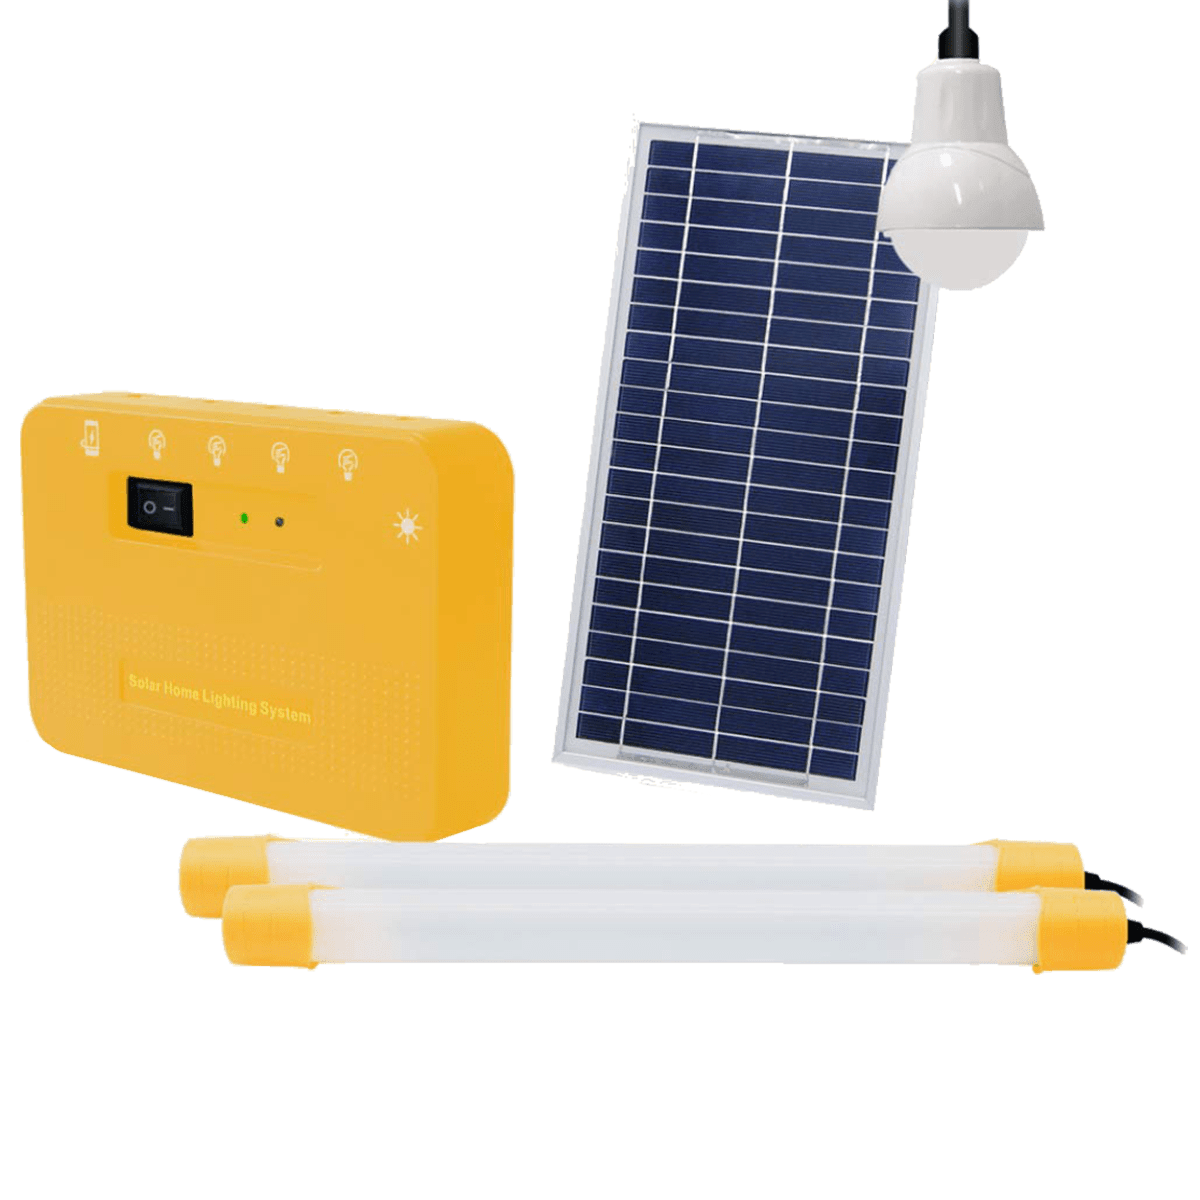 Agni Solar Home Lighting Kit 5 8 Watts Solar LED Bulb & Tube Light (Poly Crystalline Solar Panel, AG-501, Yellow)